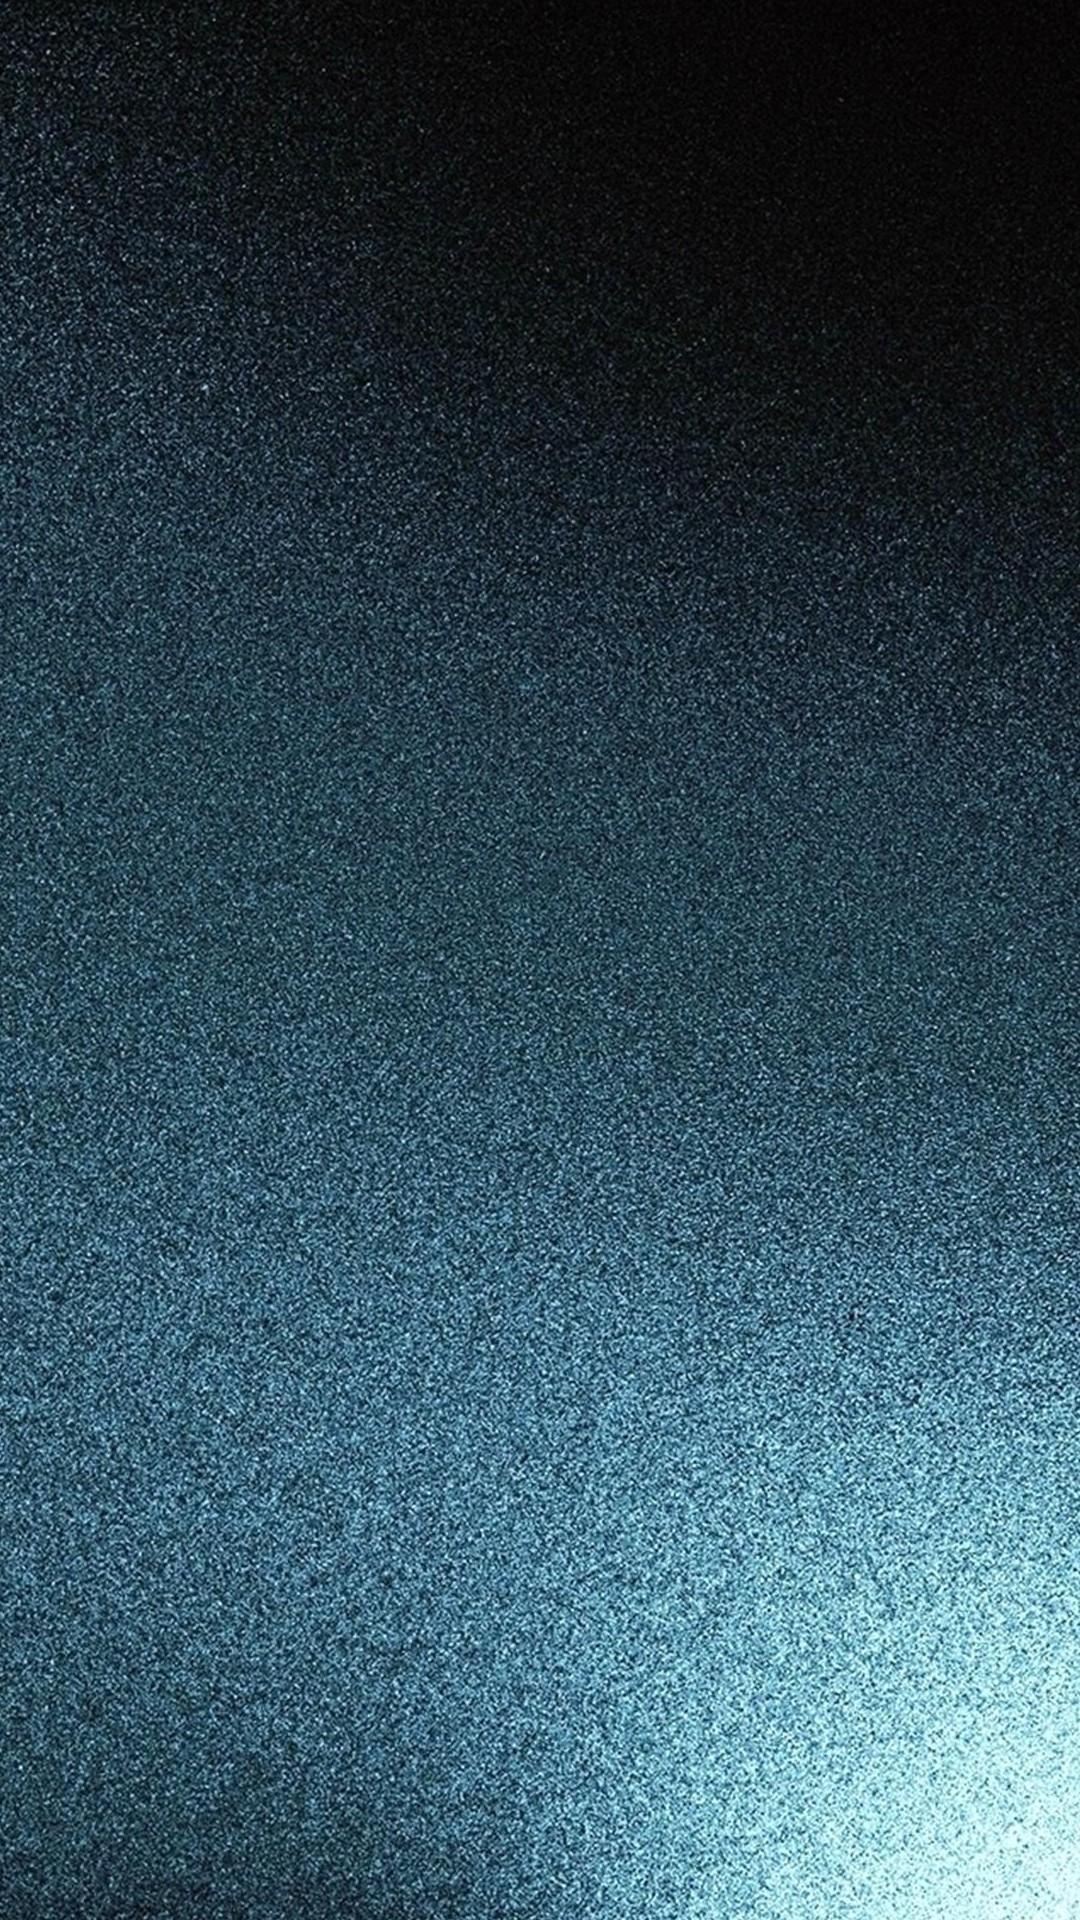 Scenery wallpaper telecharger fond d 39 ecran smartphone for Fond ecran smartphone